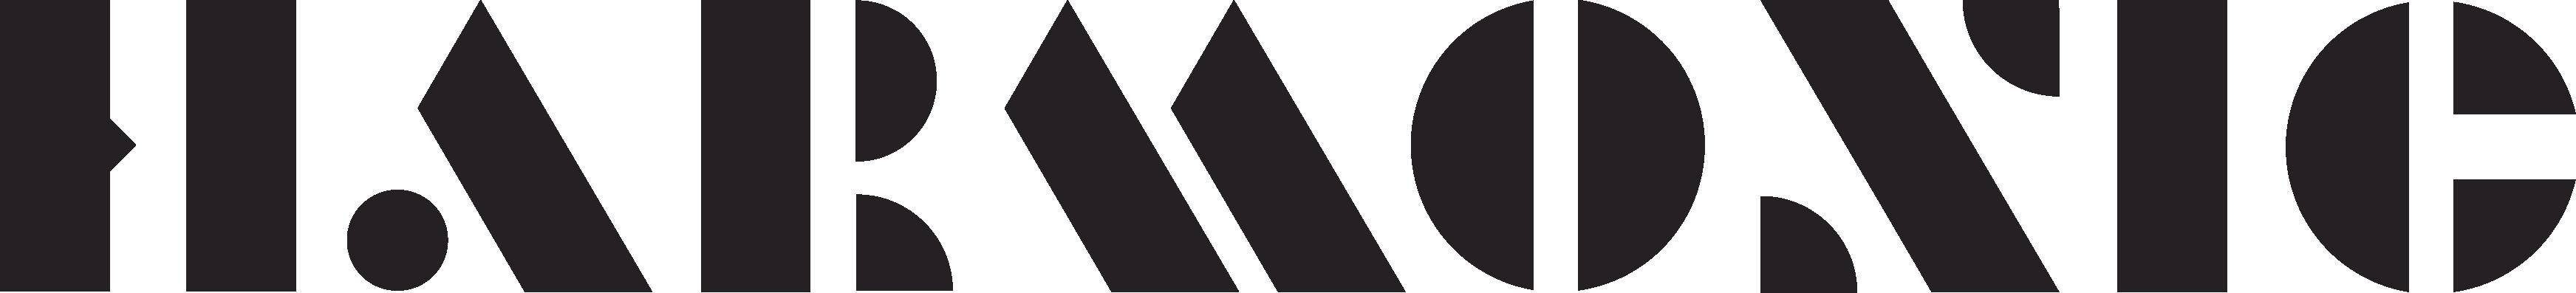 Harmonic Wordmark Logo